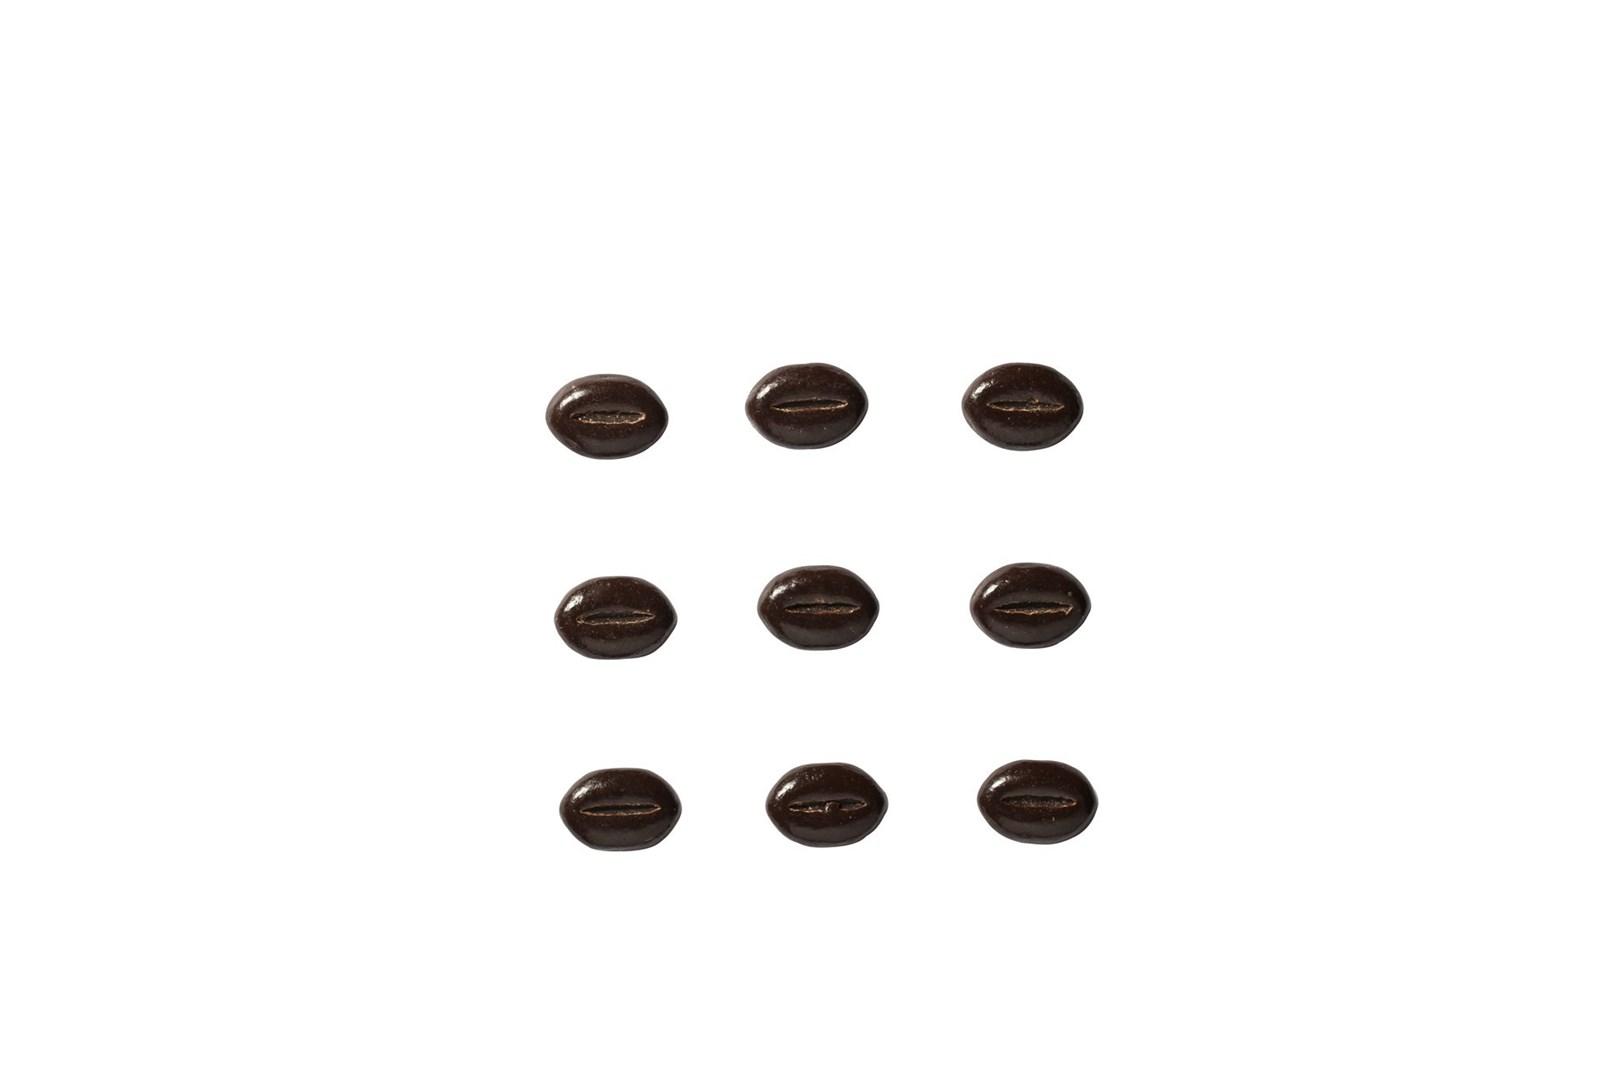 Productafbeelding Mona Lisa 3D chocolade - mokkabonen - zak 1 kg